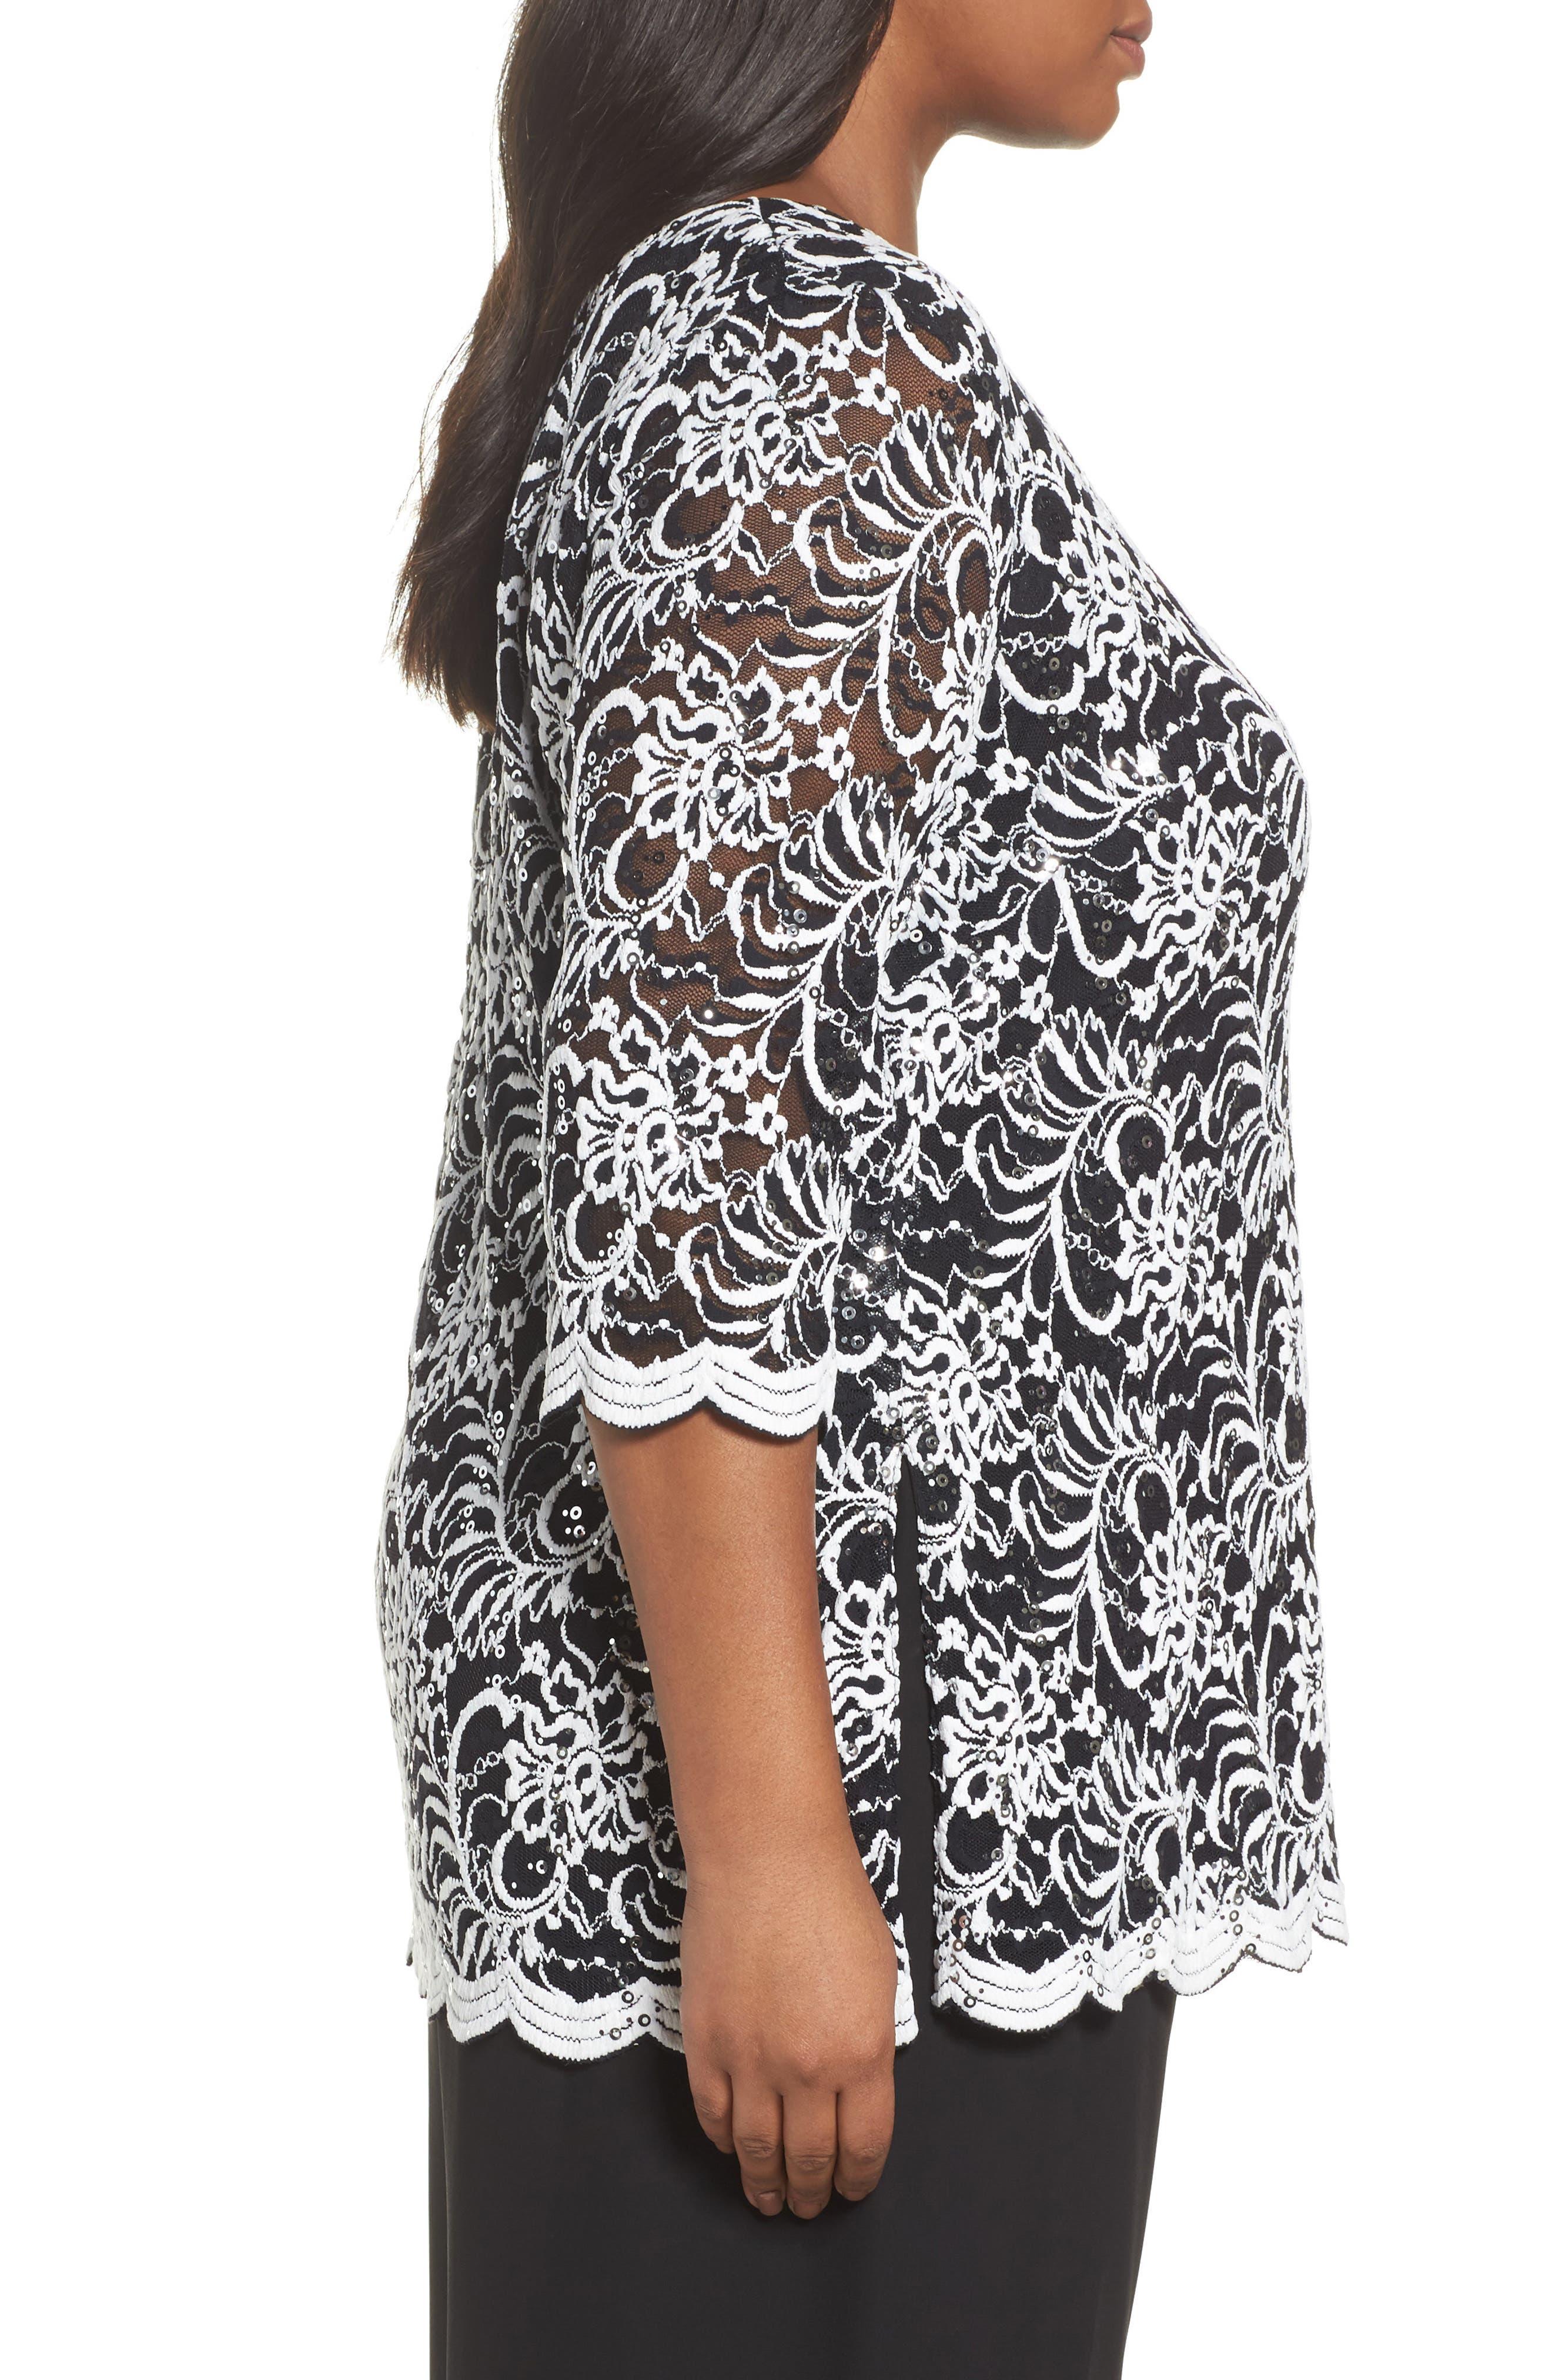 Embroidered Tulle Blouse,                             Alternate thumbnail 3, color,                             Black/ White